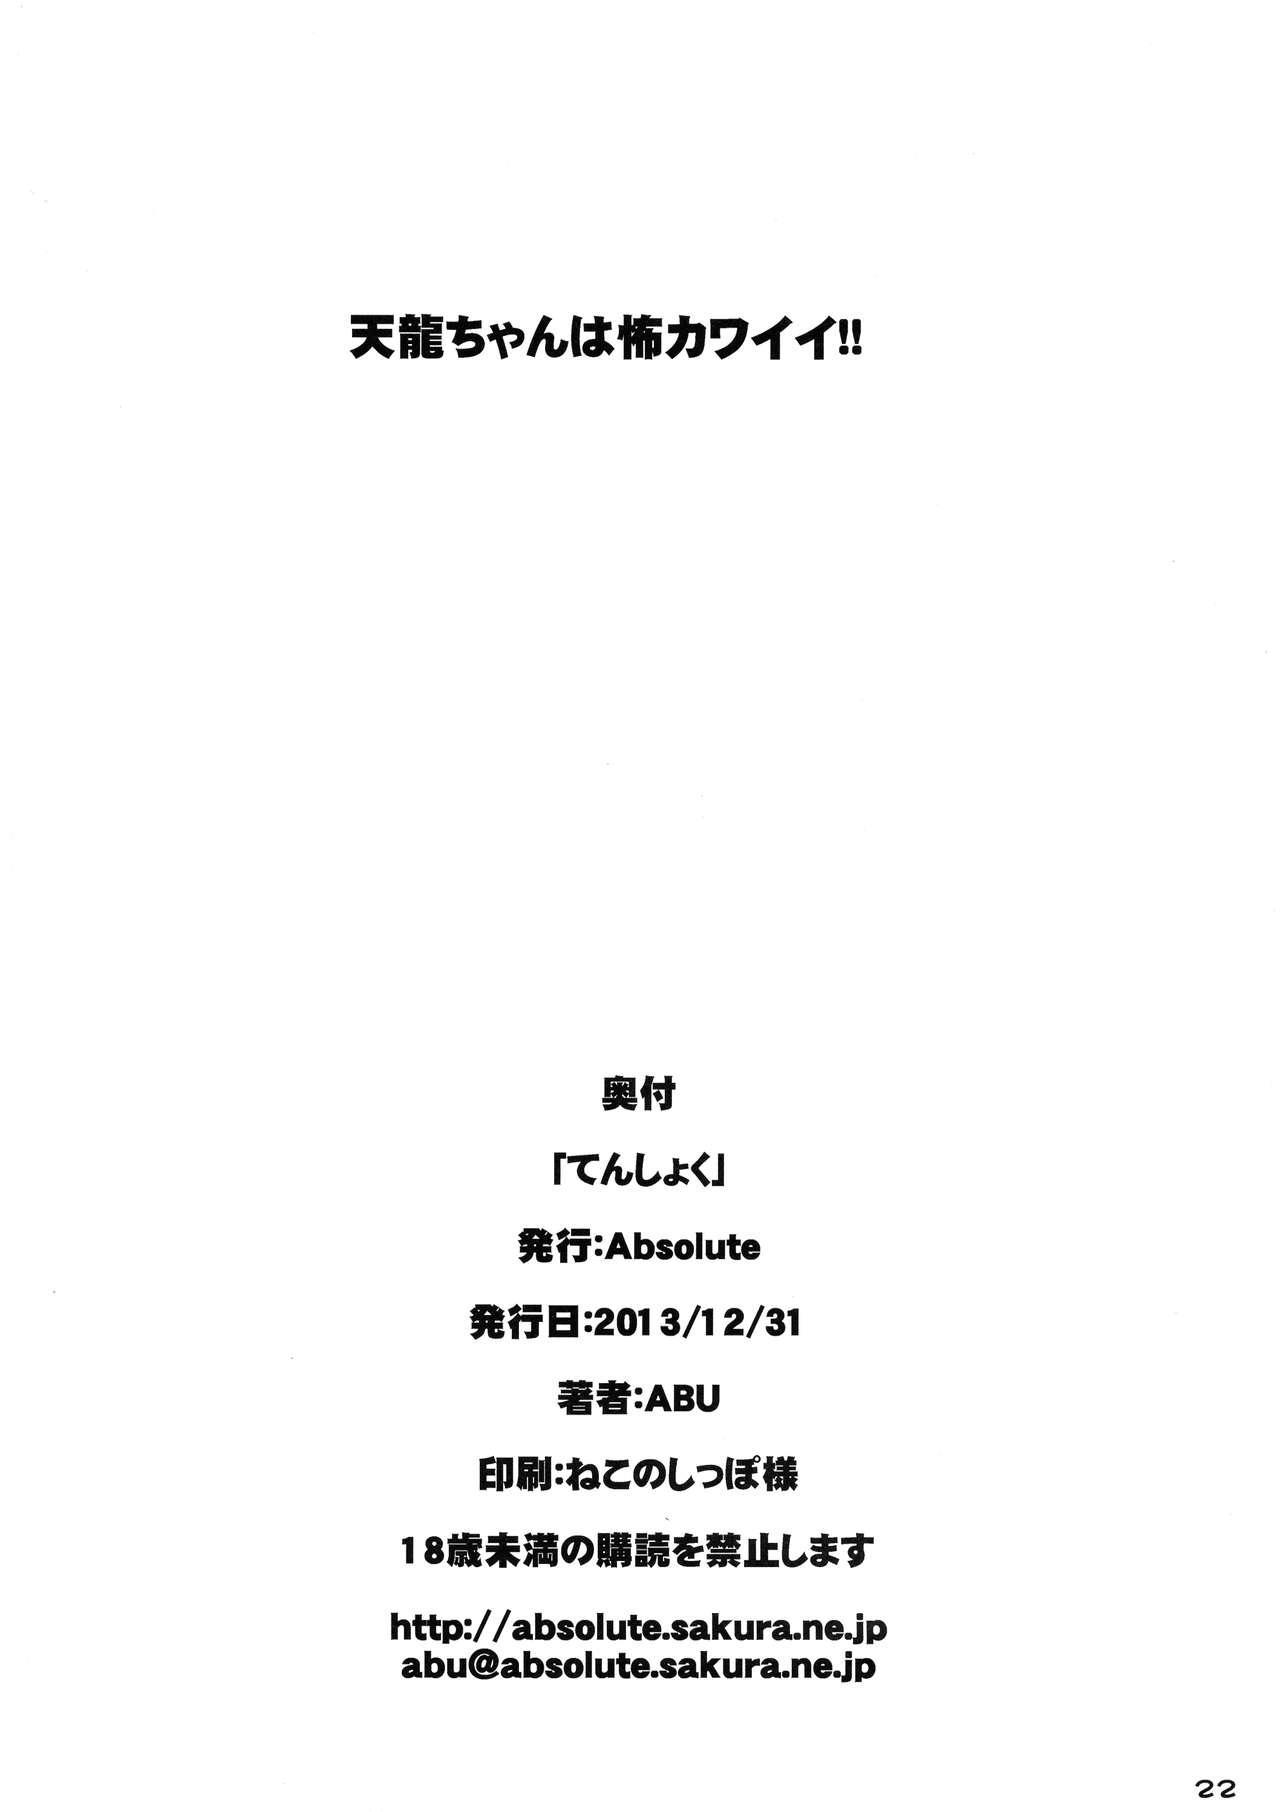 Tenshoku 19